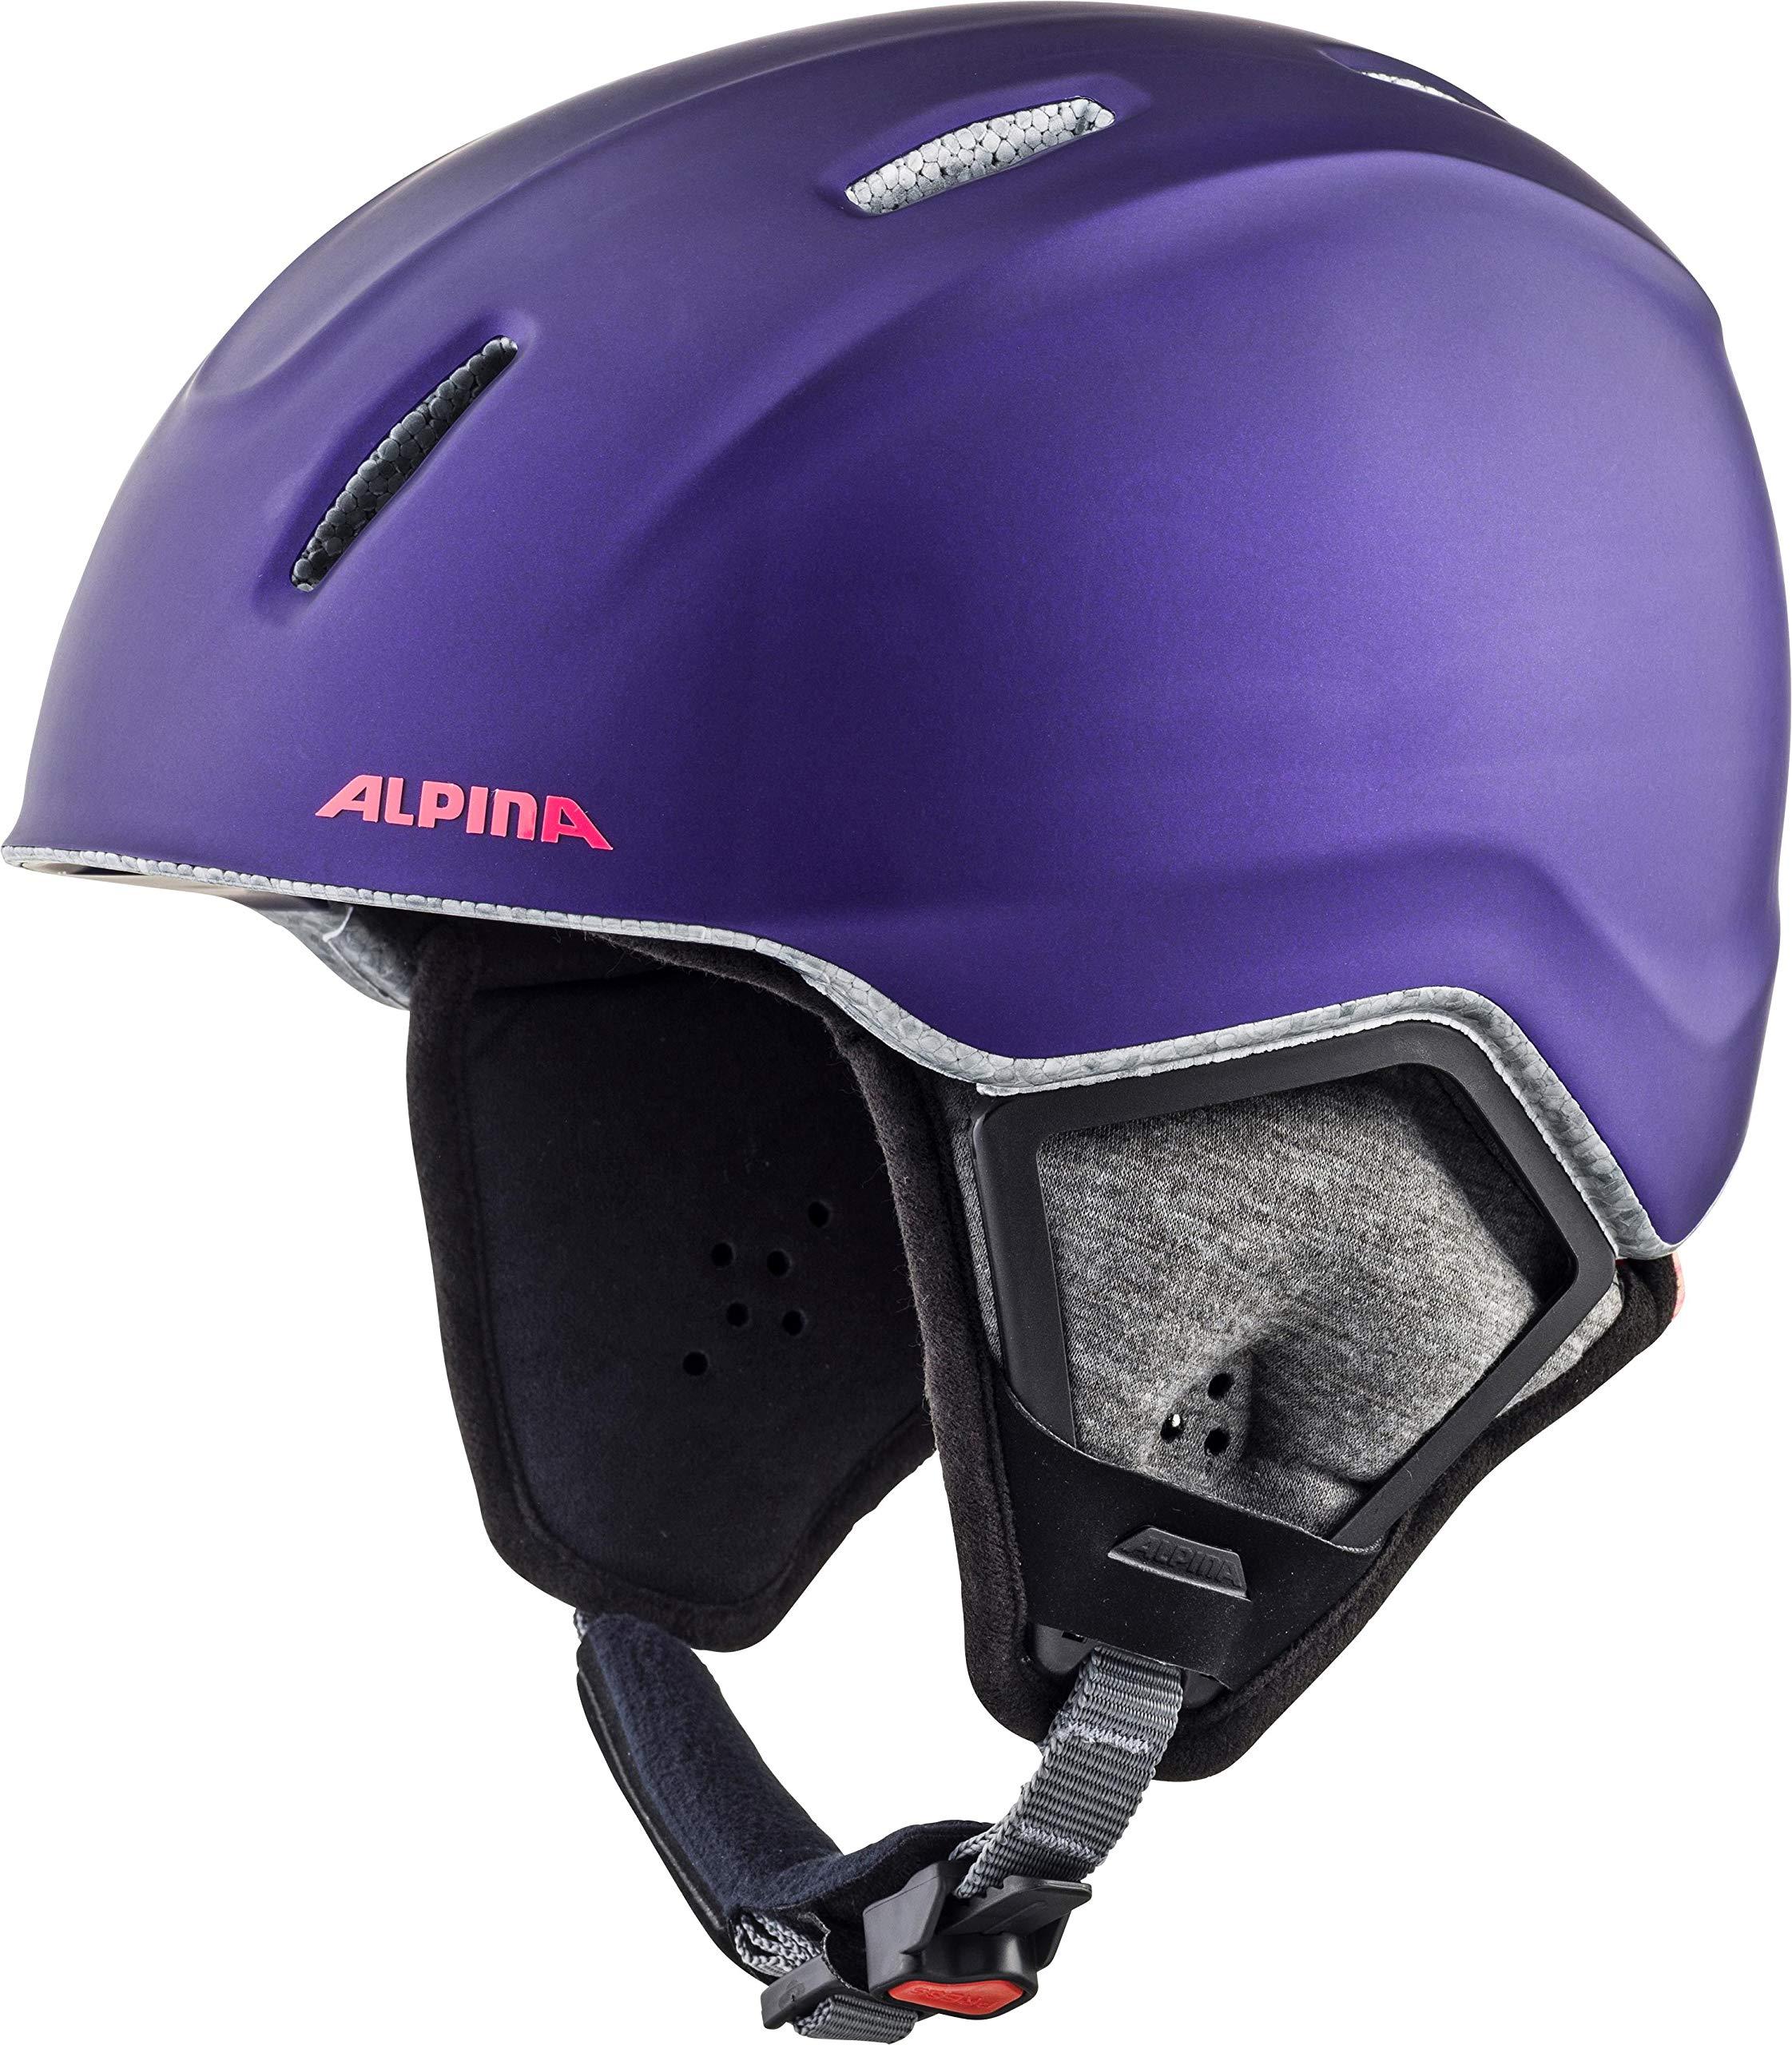 ALPINA Unisex - Kinder, CARAT XT Skihelm, royal-purple matt, 51-55 cm